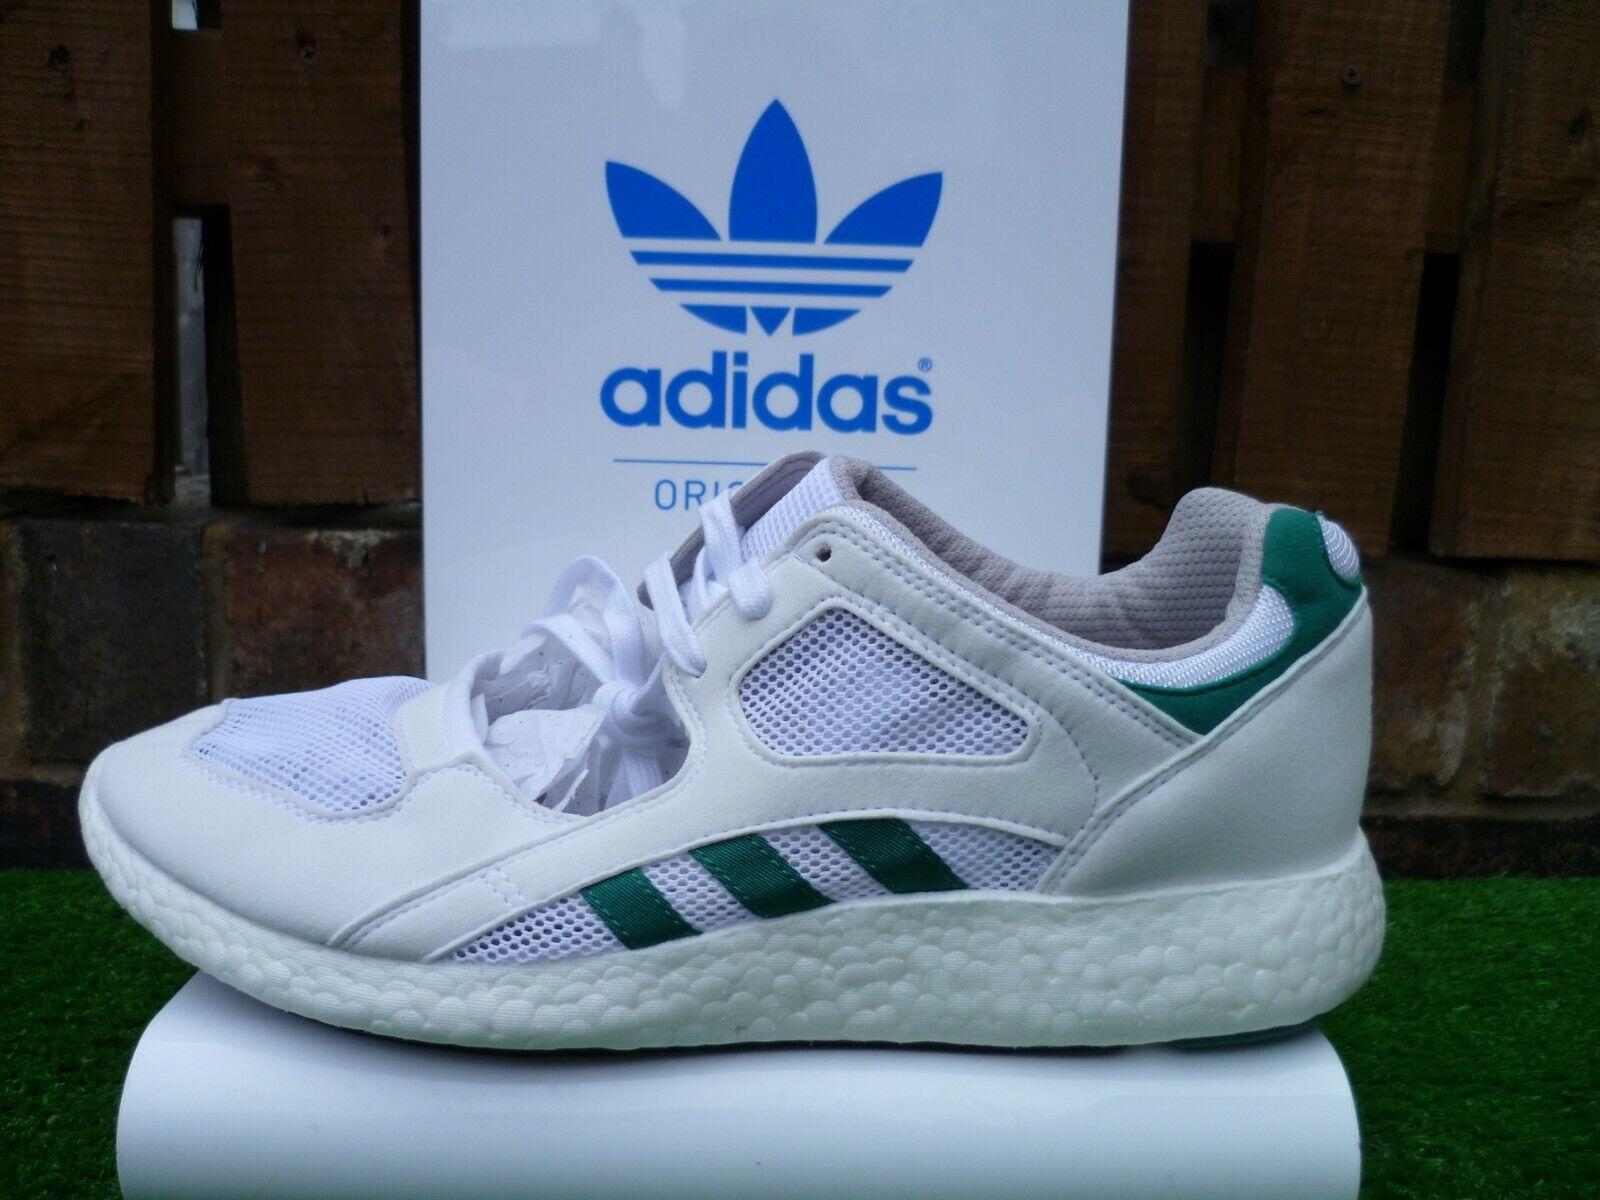 Adidas EQUIPMENT Racing 1991 BOOST og UK10 Nuevo Y En Caja 2015 Raro Mira EQT años 90 corrojoores